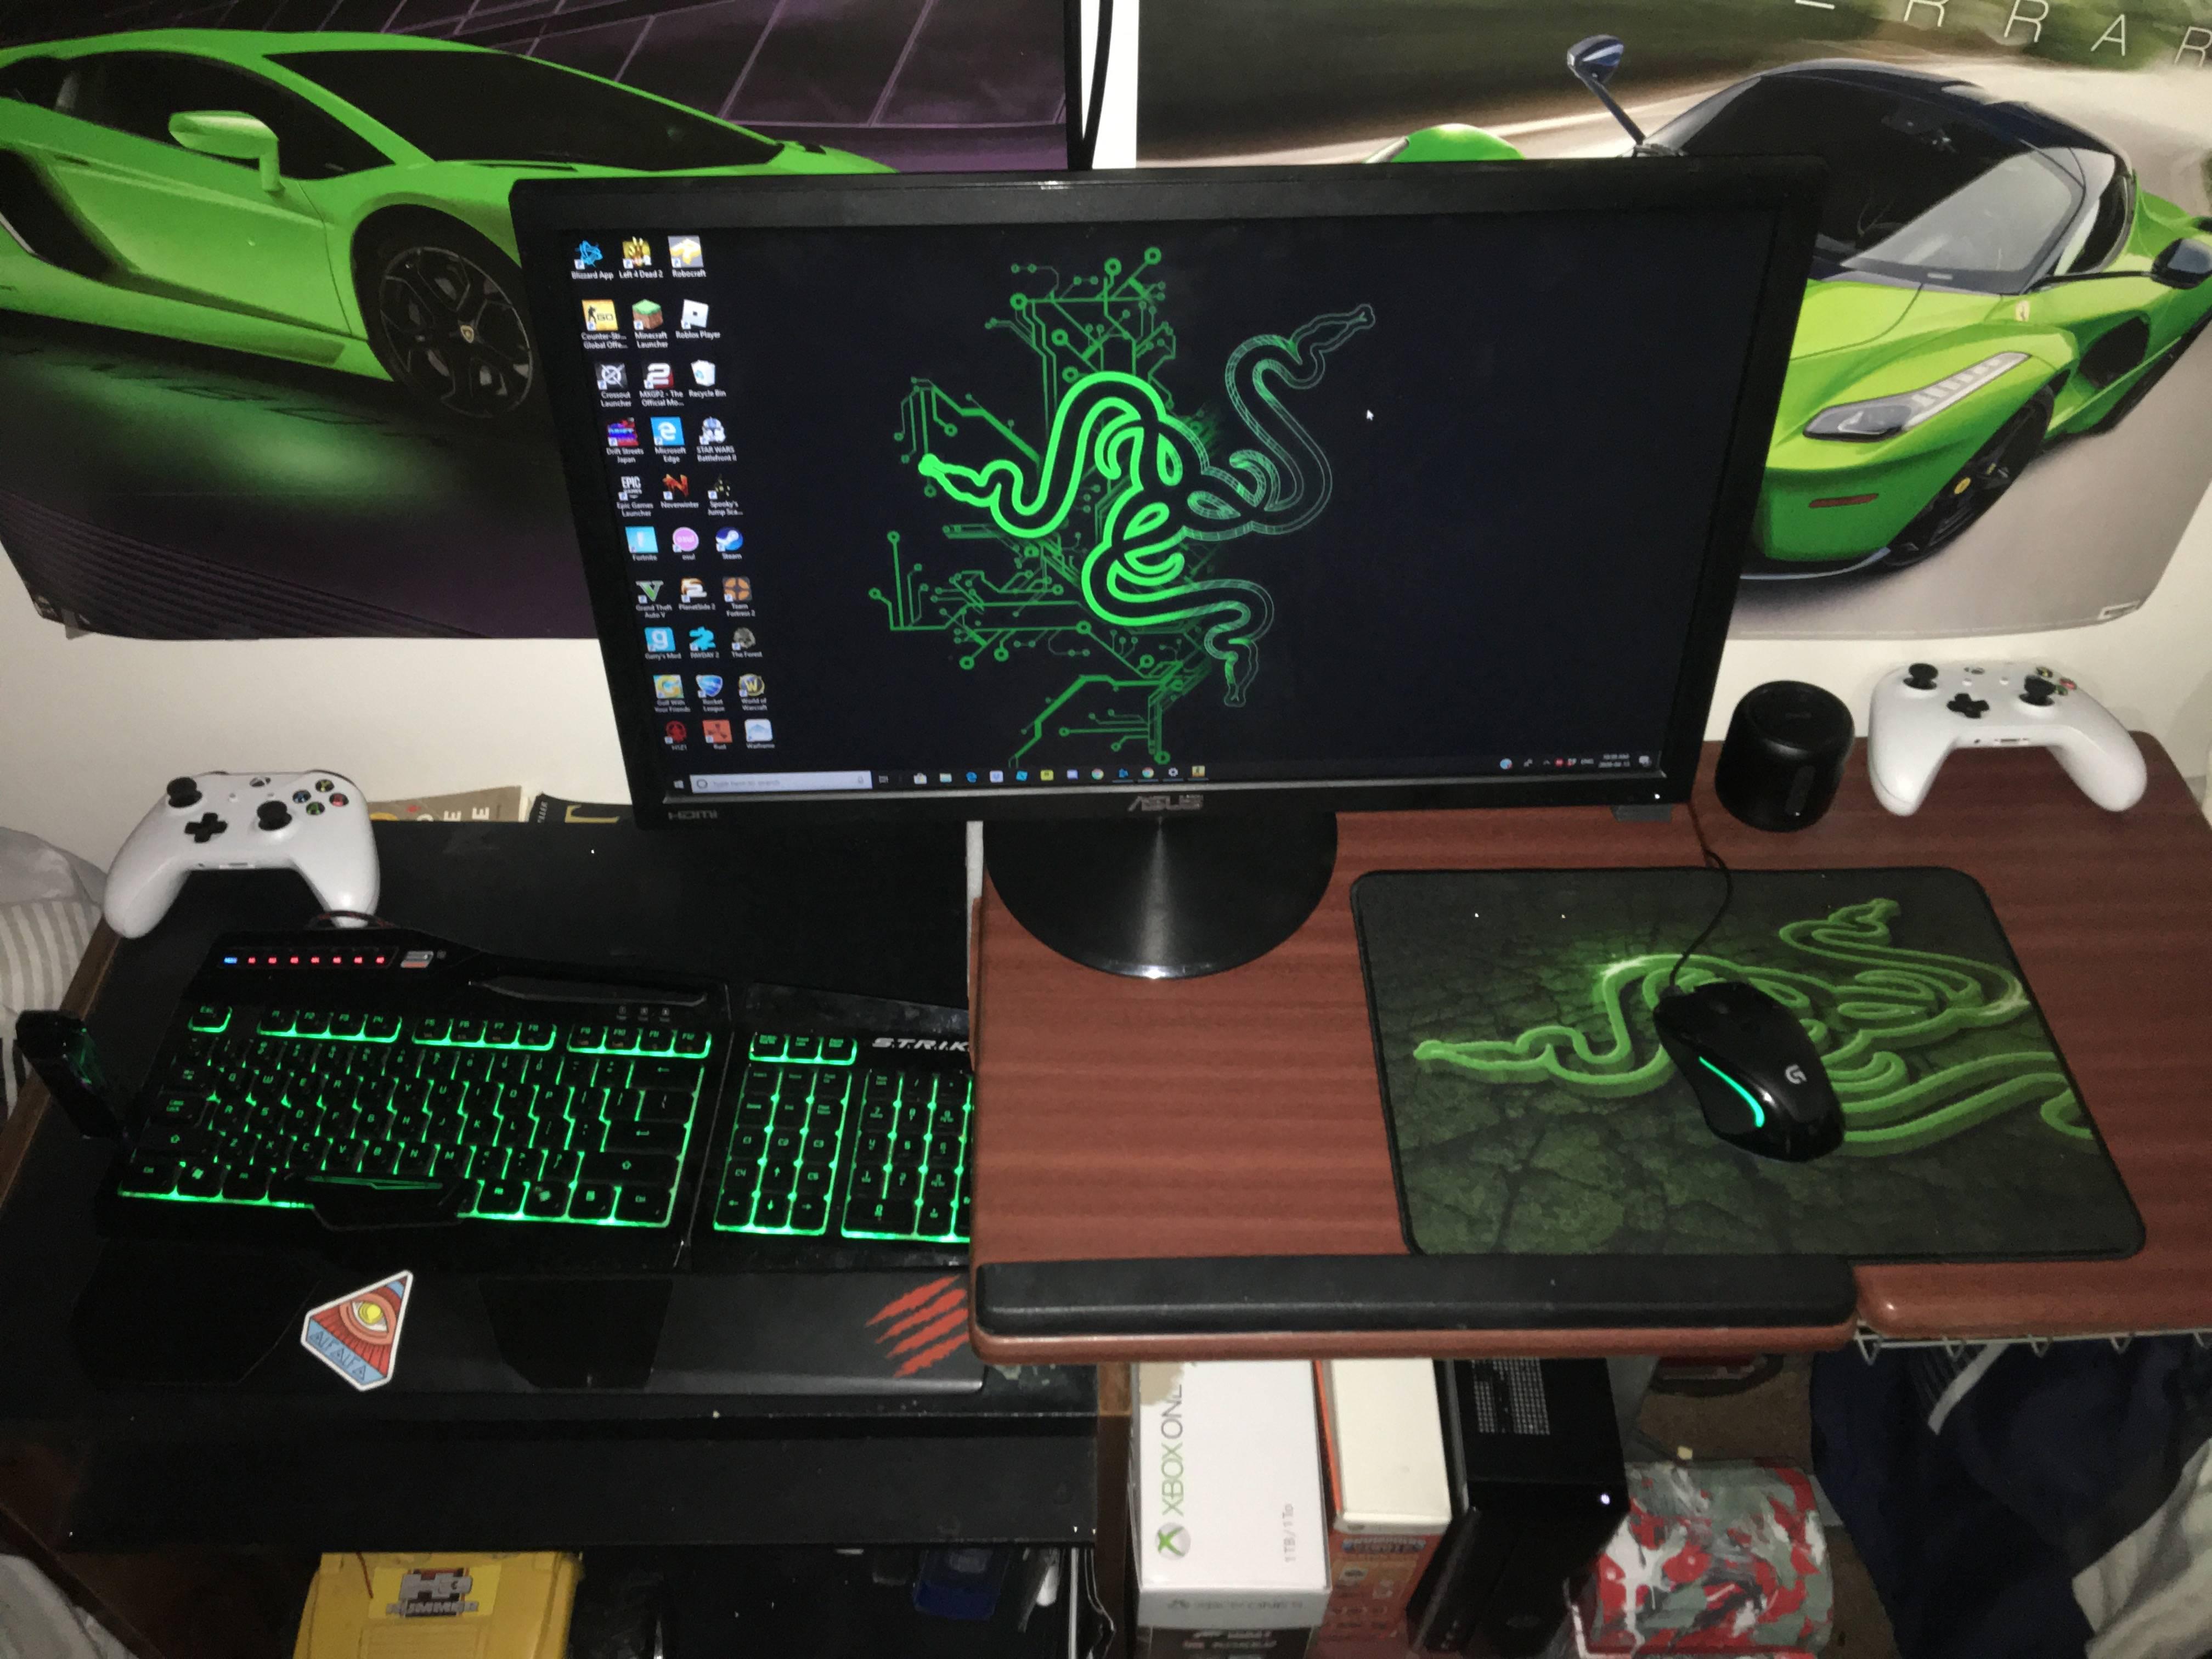 spicysushi16's Setup - Pre-built pc gaming setup | Scooget